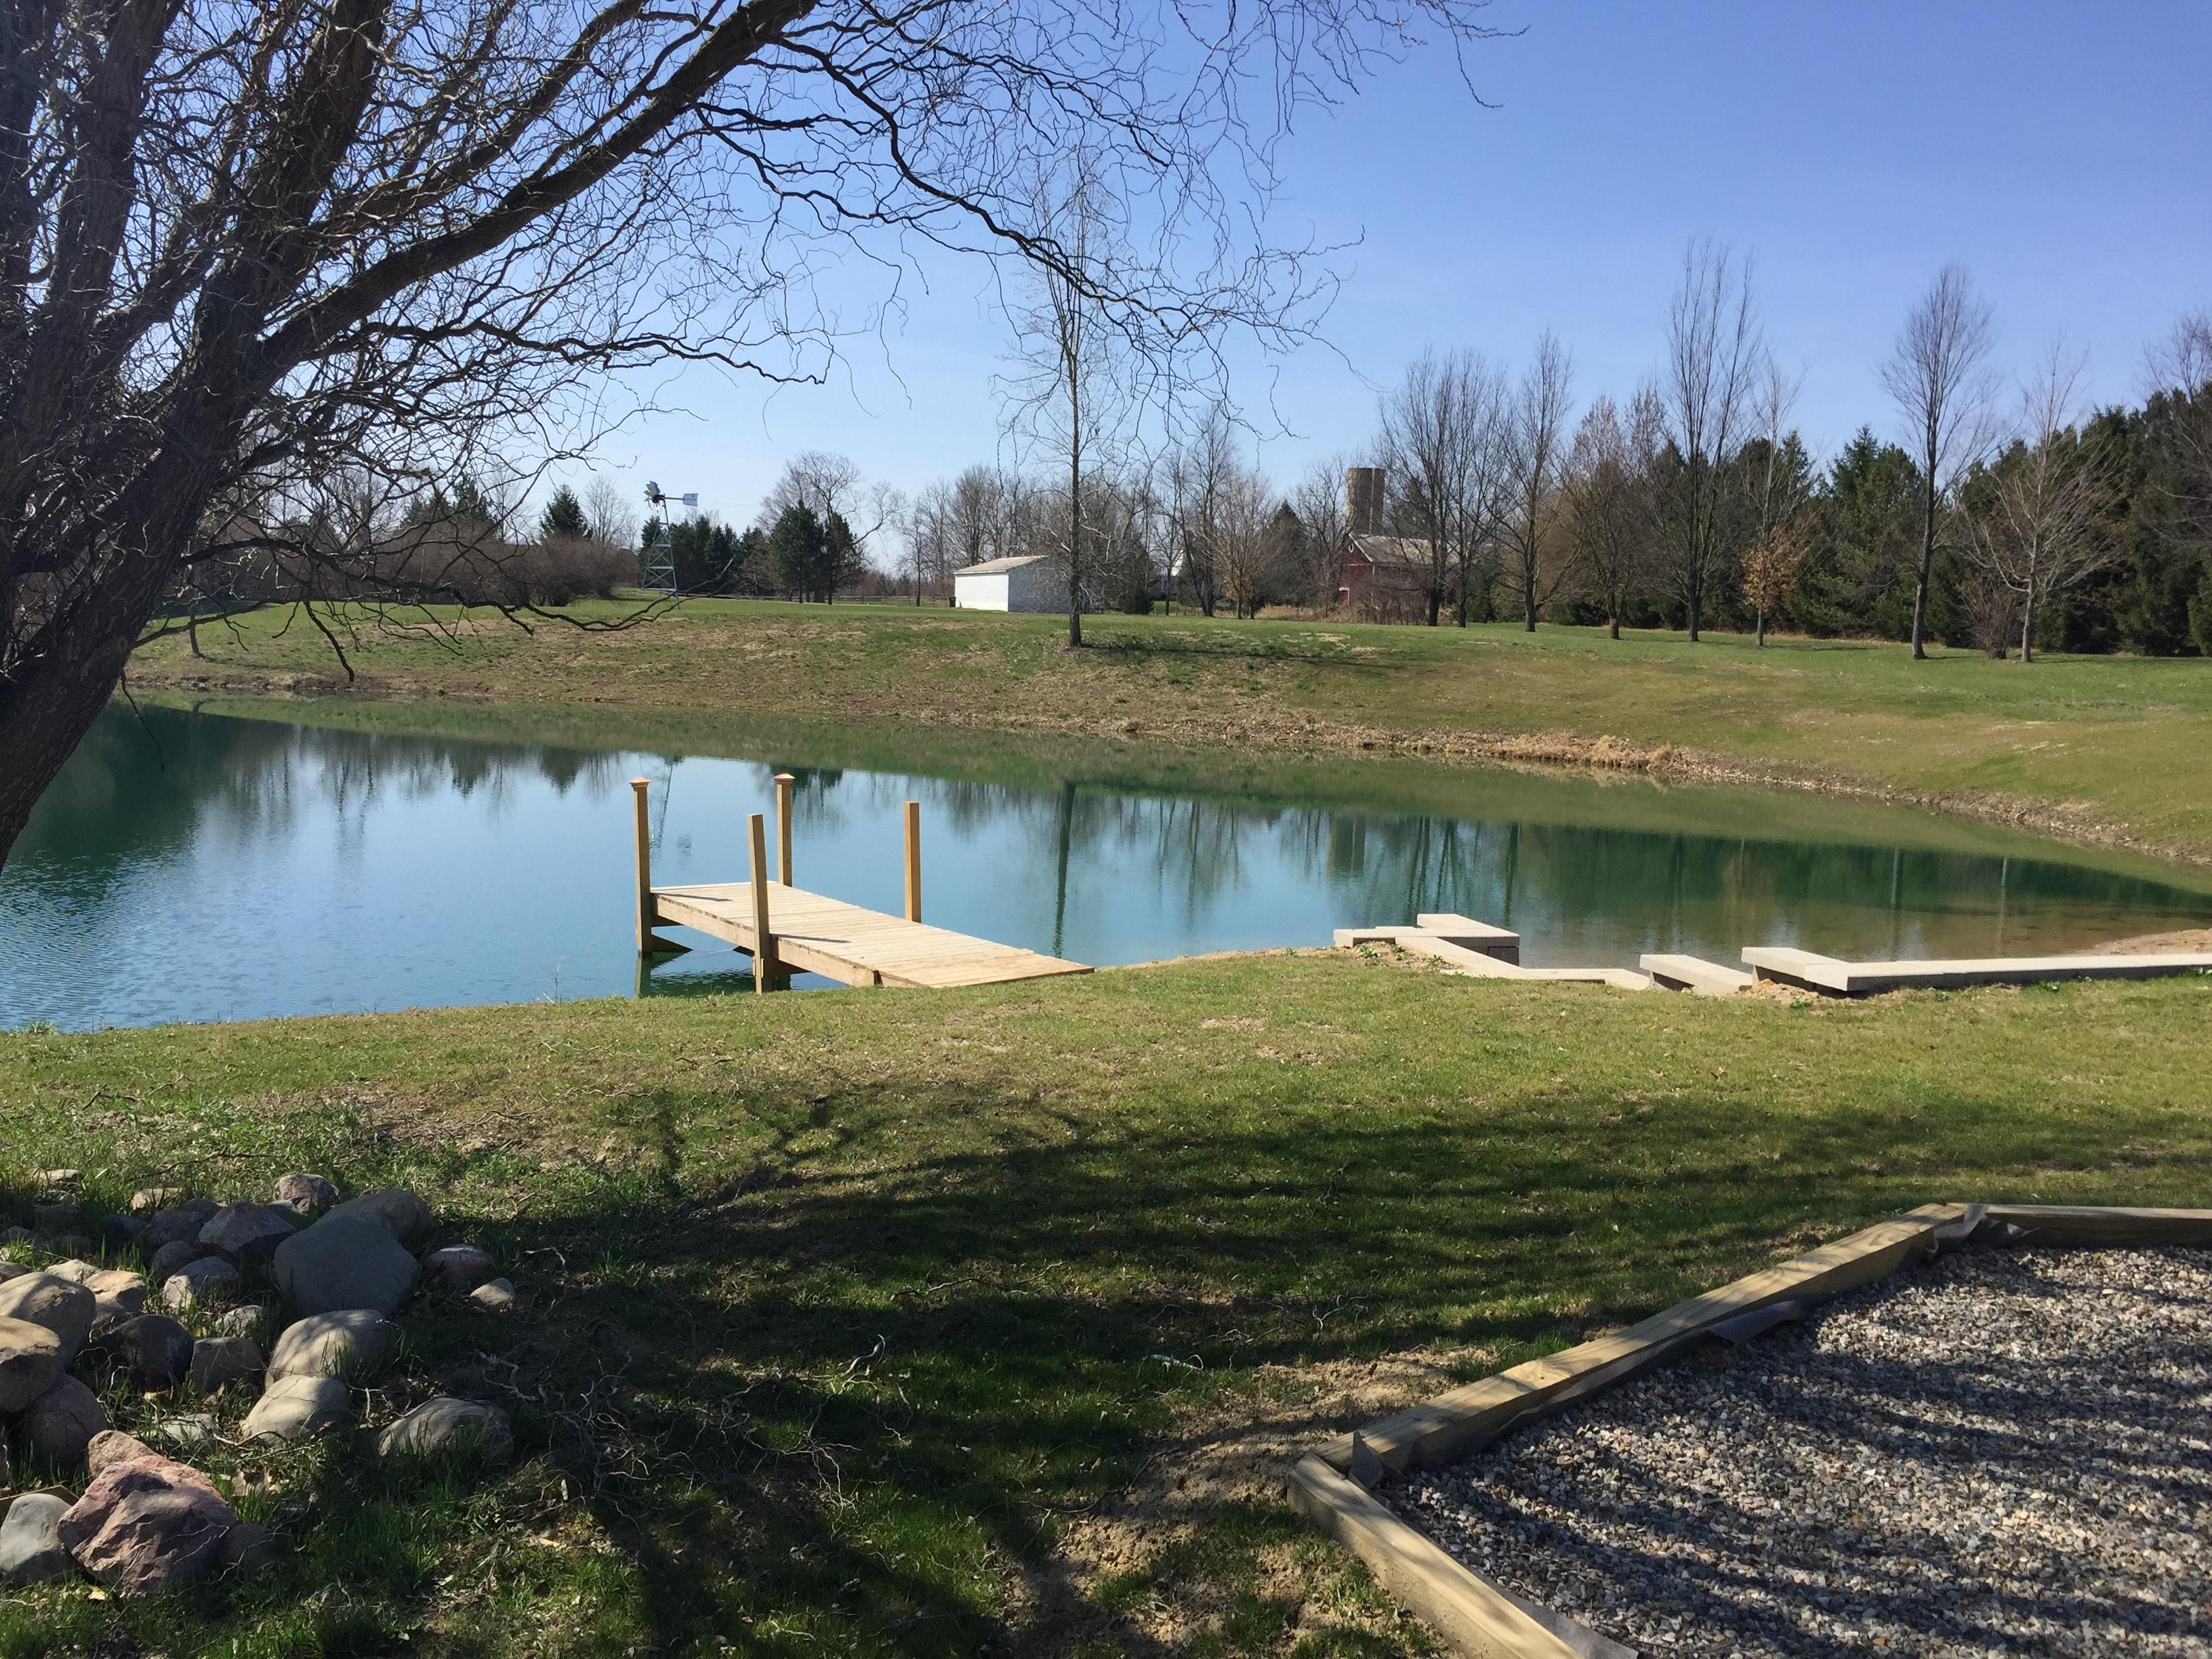 Pond_Problems_Howell_Michigan_windmill_beach_18.jpg